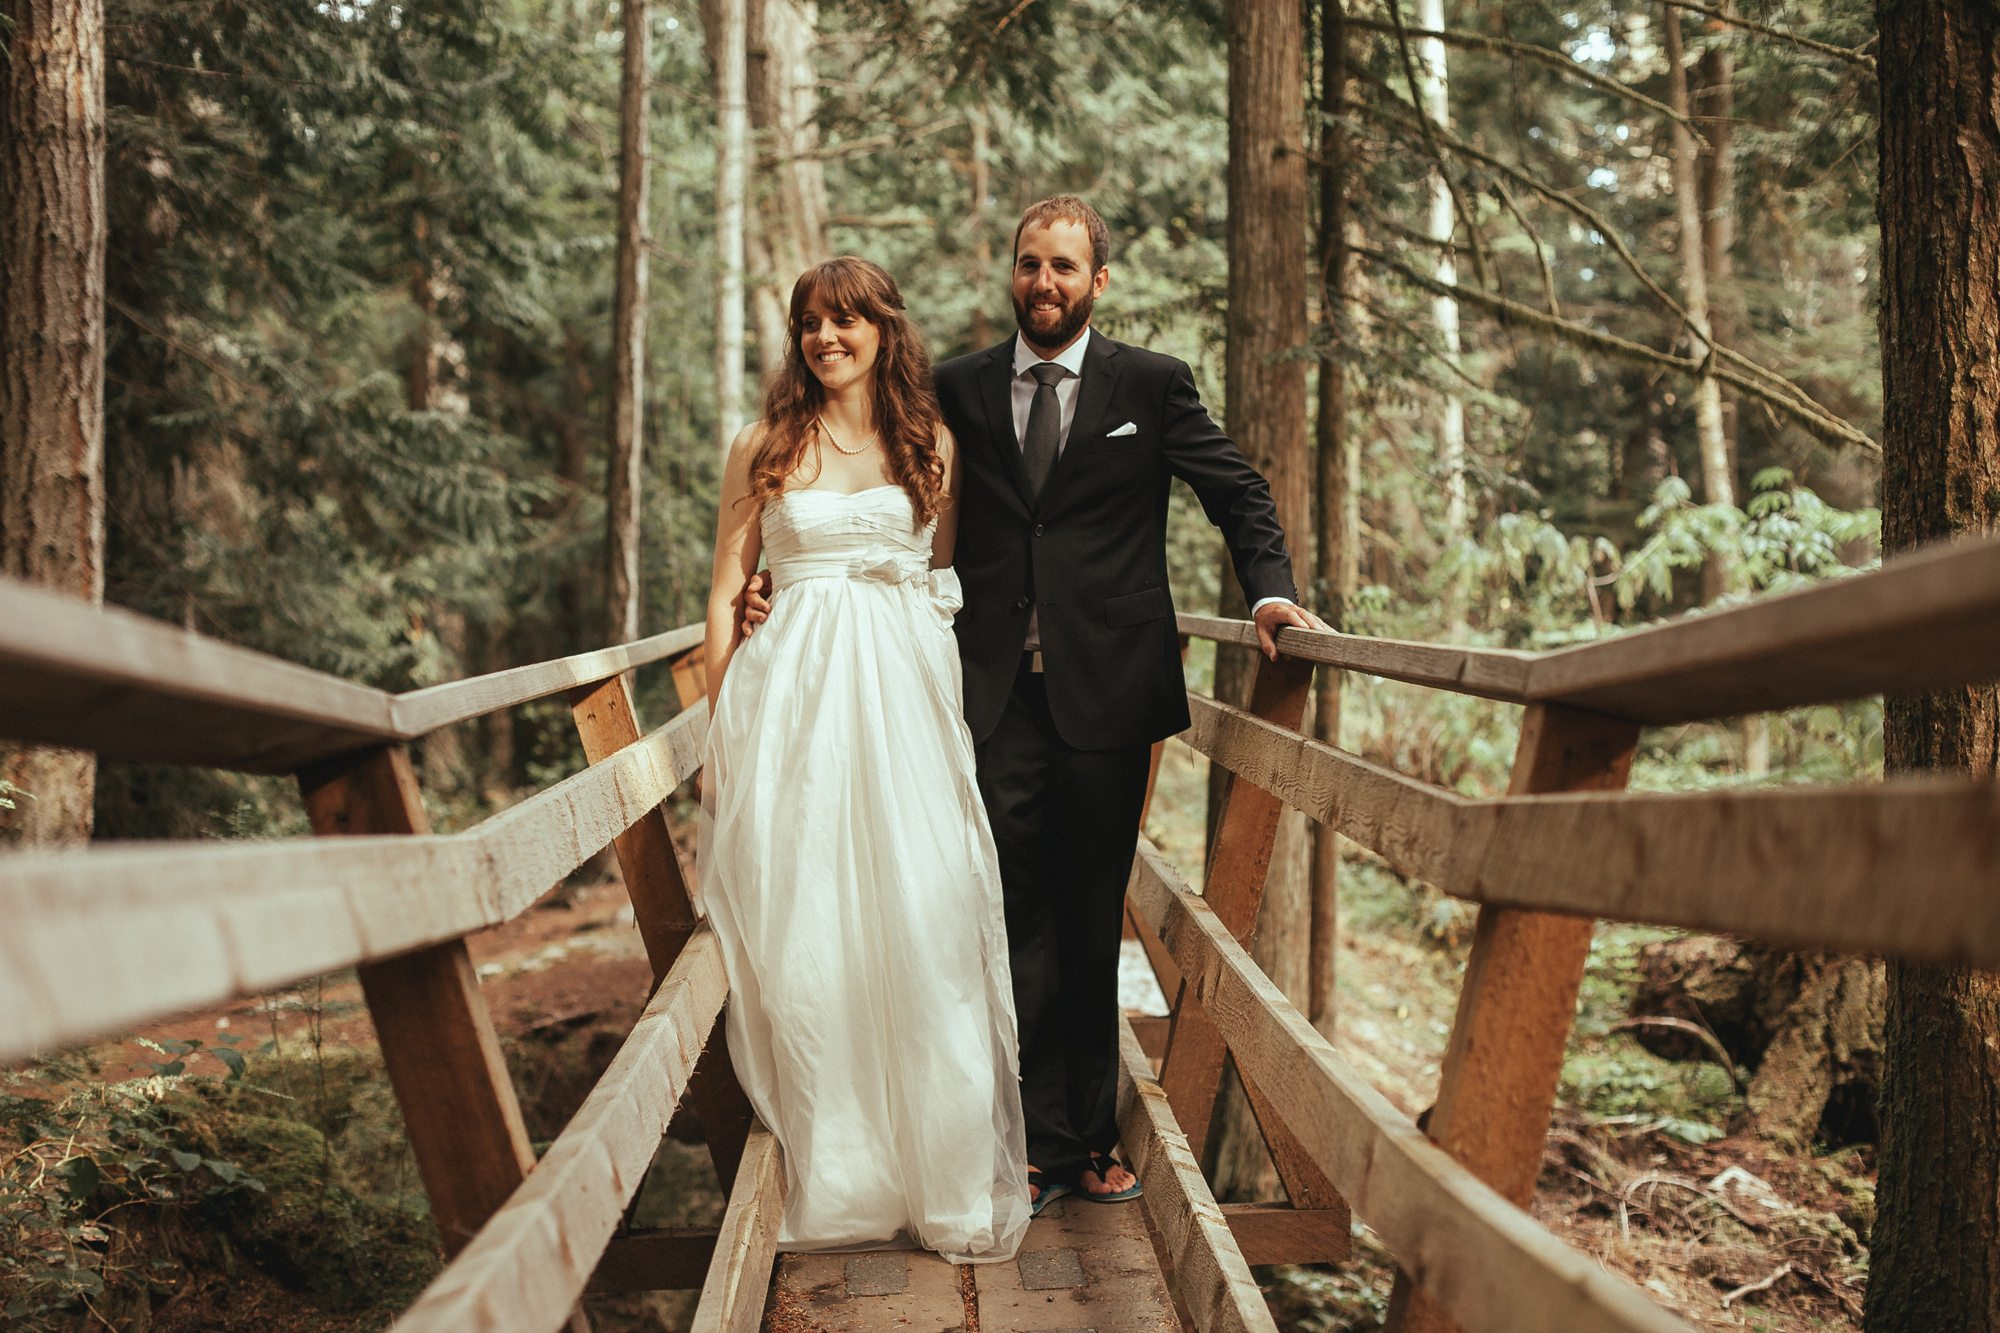 gibsons-wedding-photography-robert-devon38